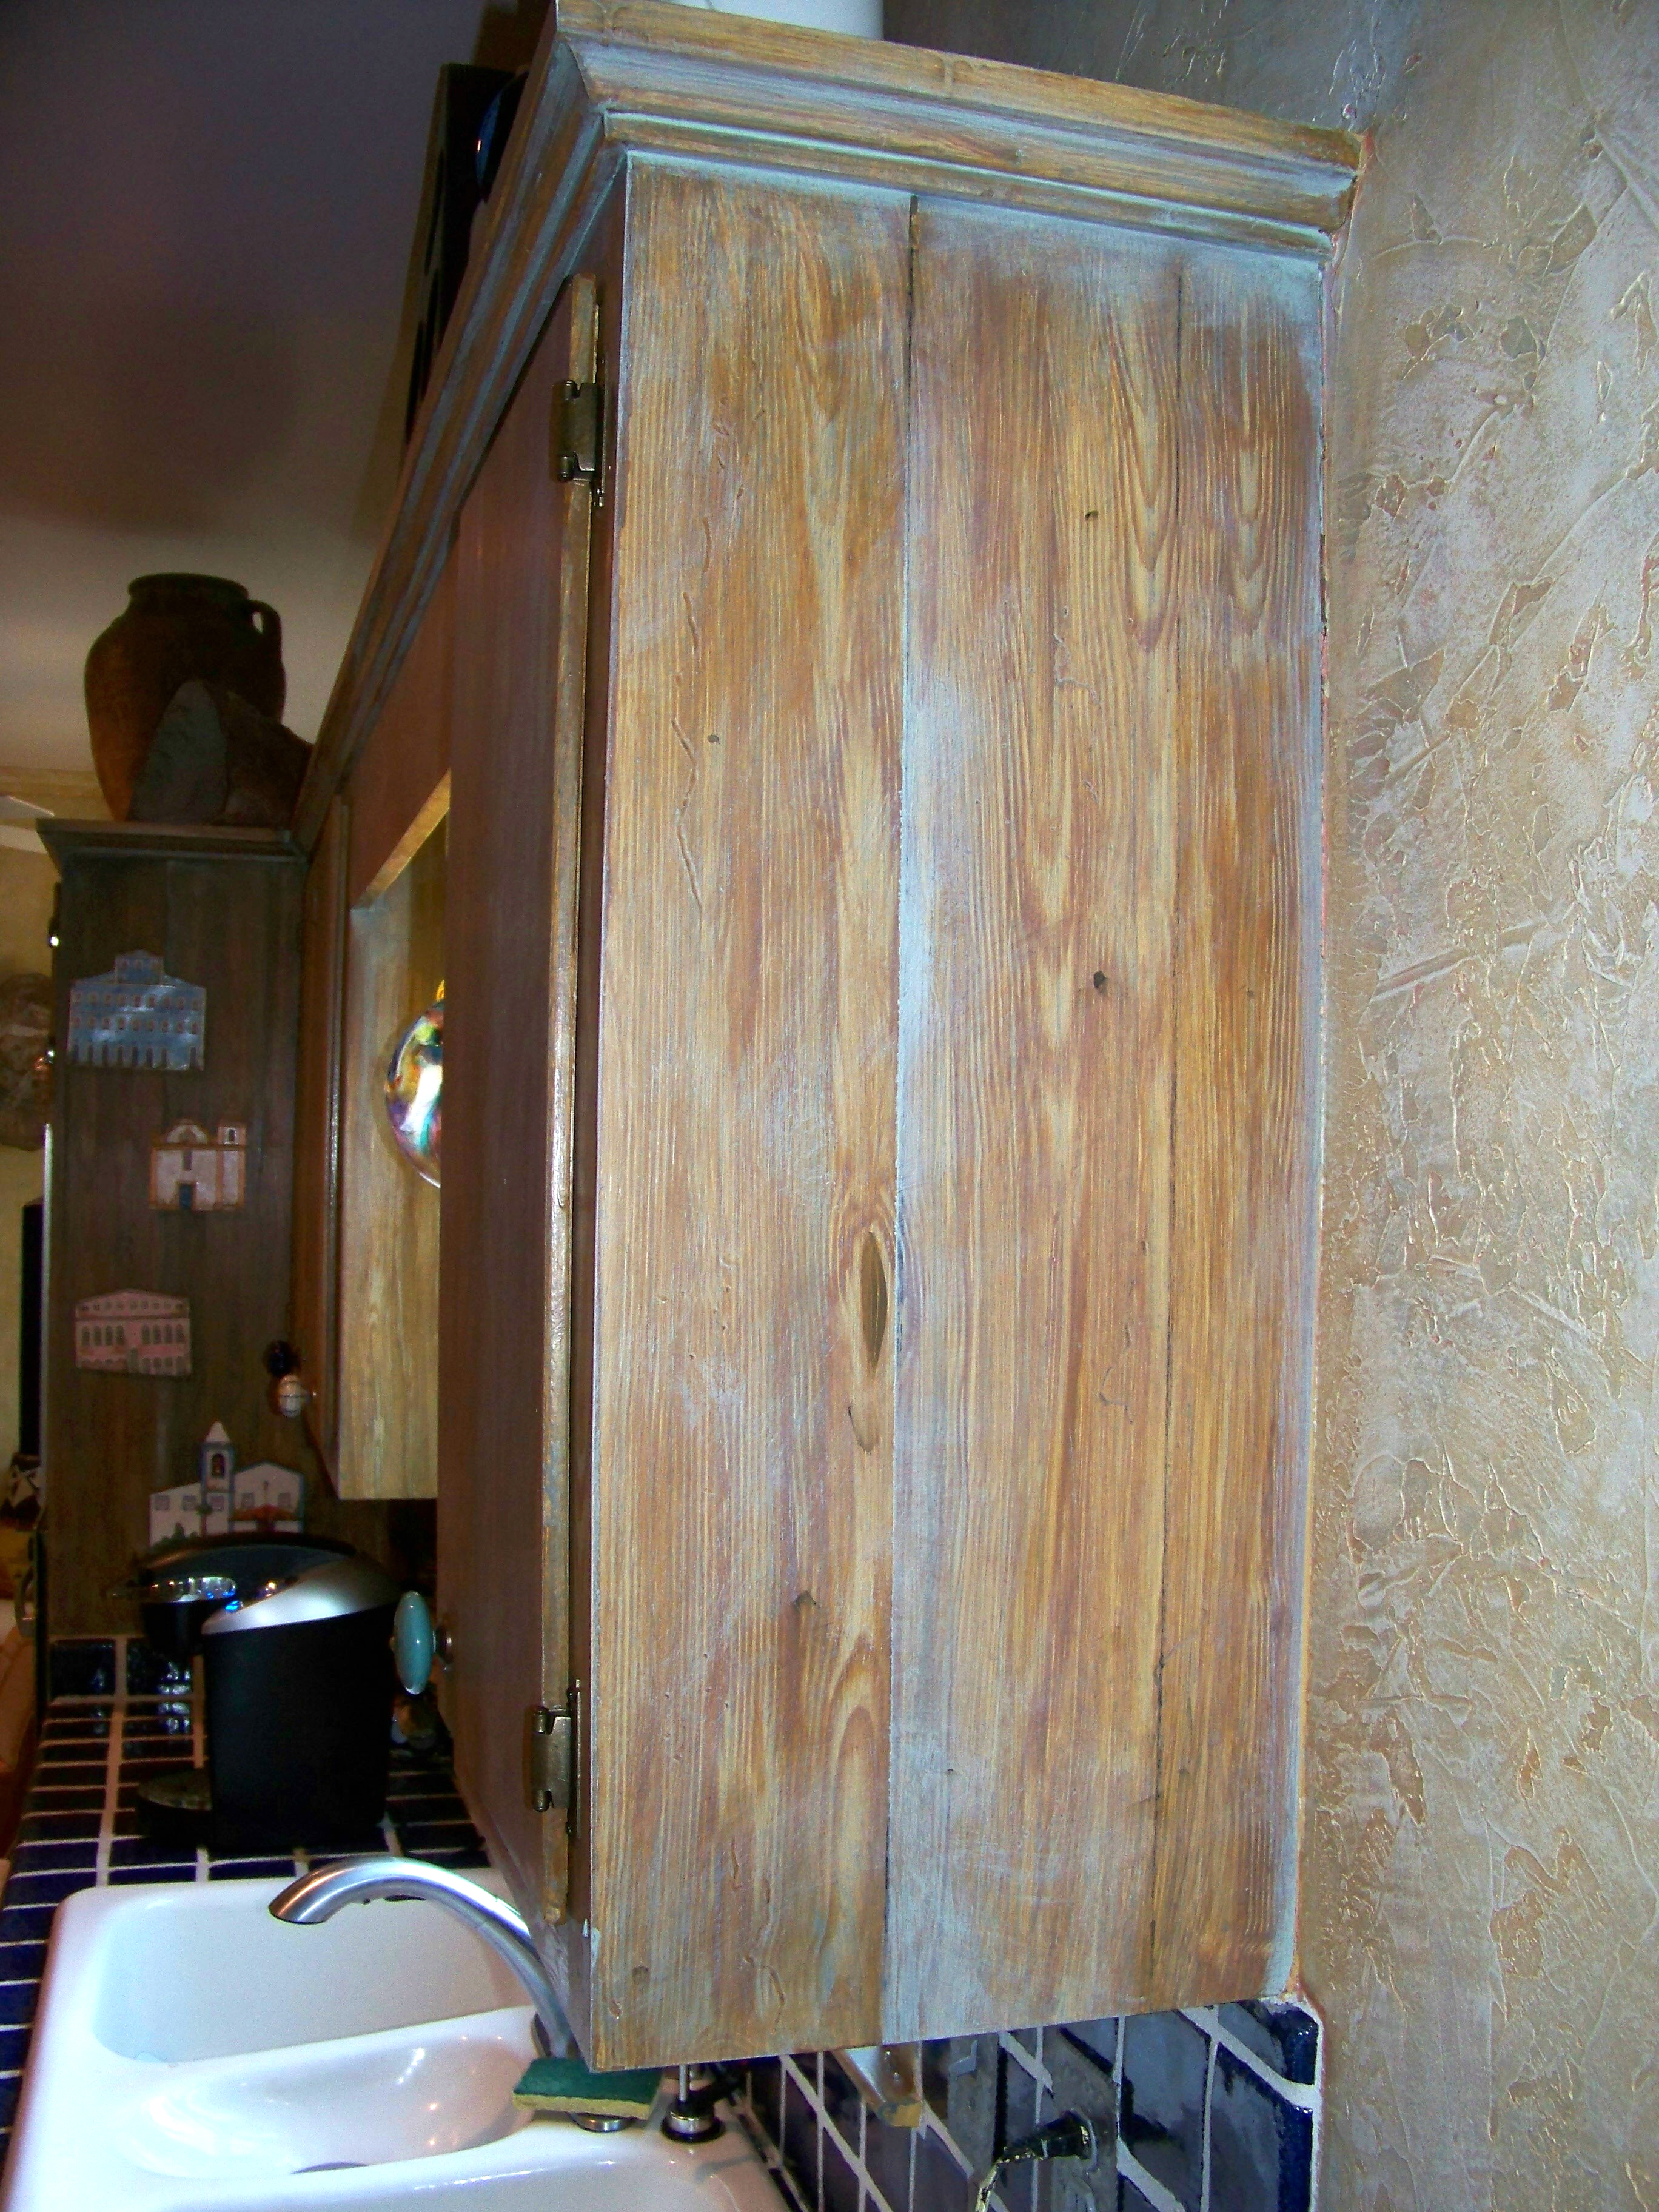 Faux Old Wood Southwest Theme